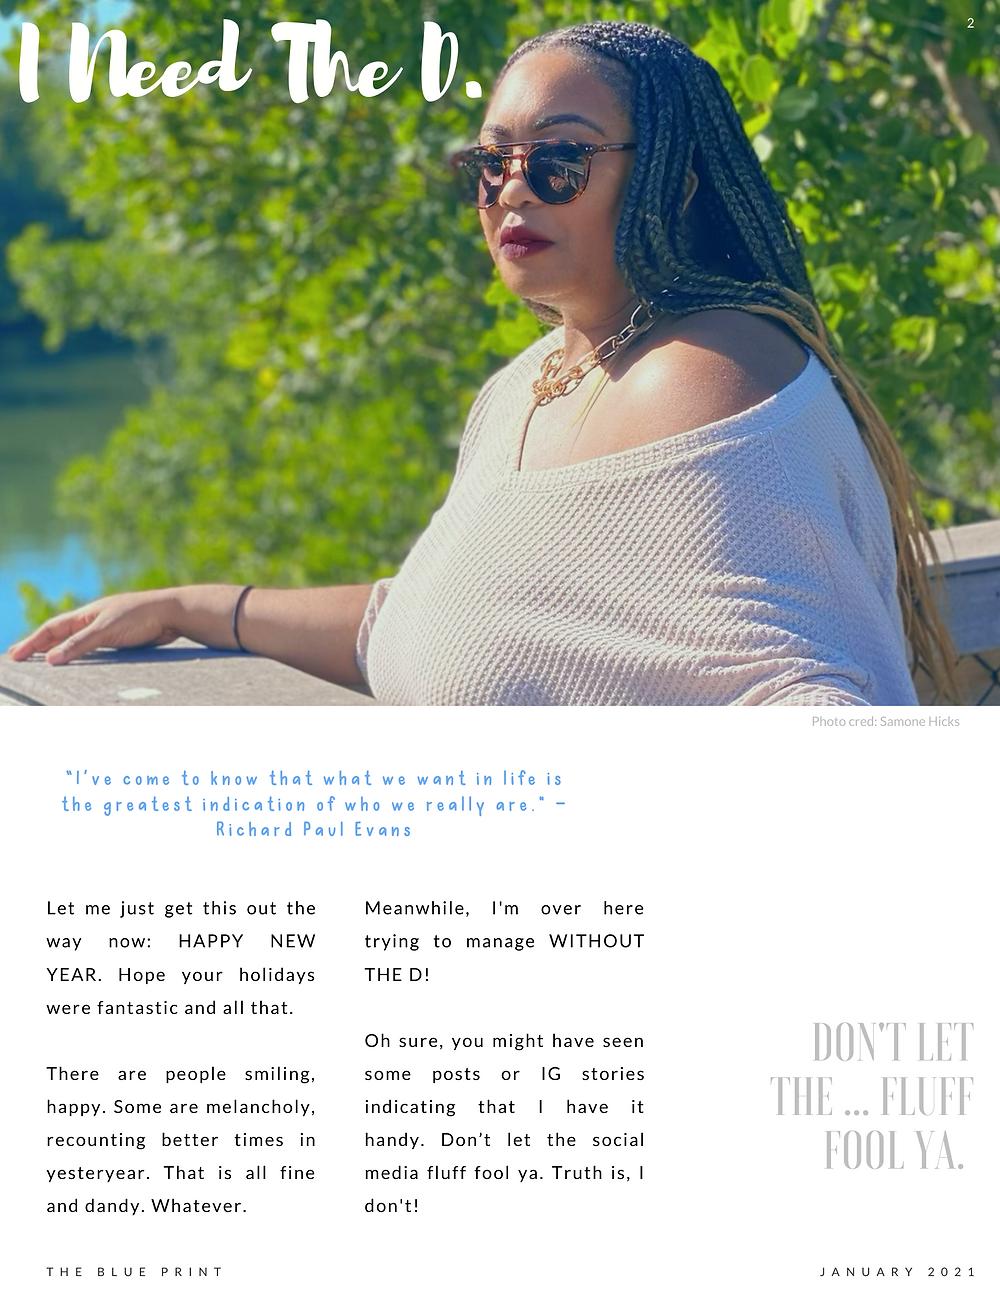 The Blue Print | January 2021| I Need The D.